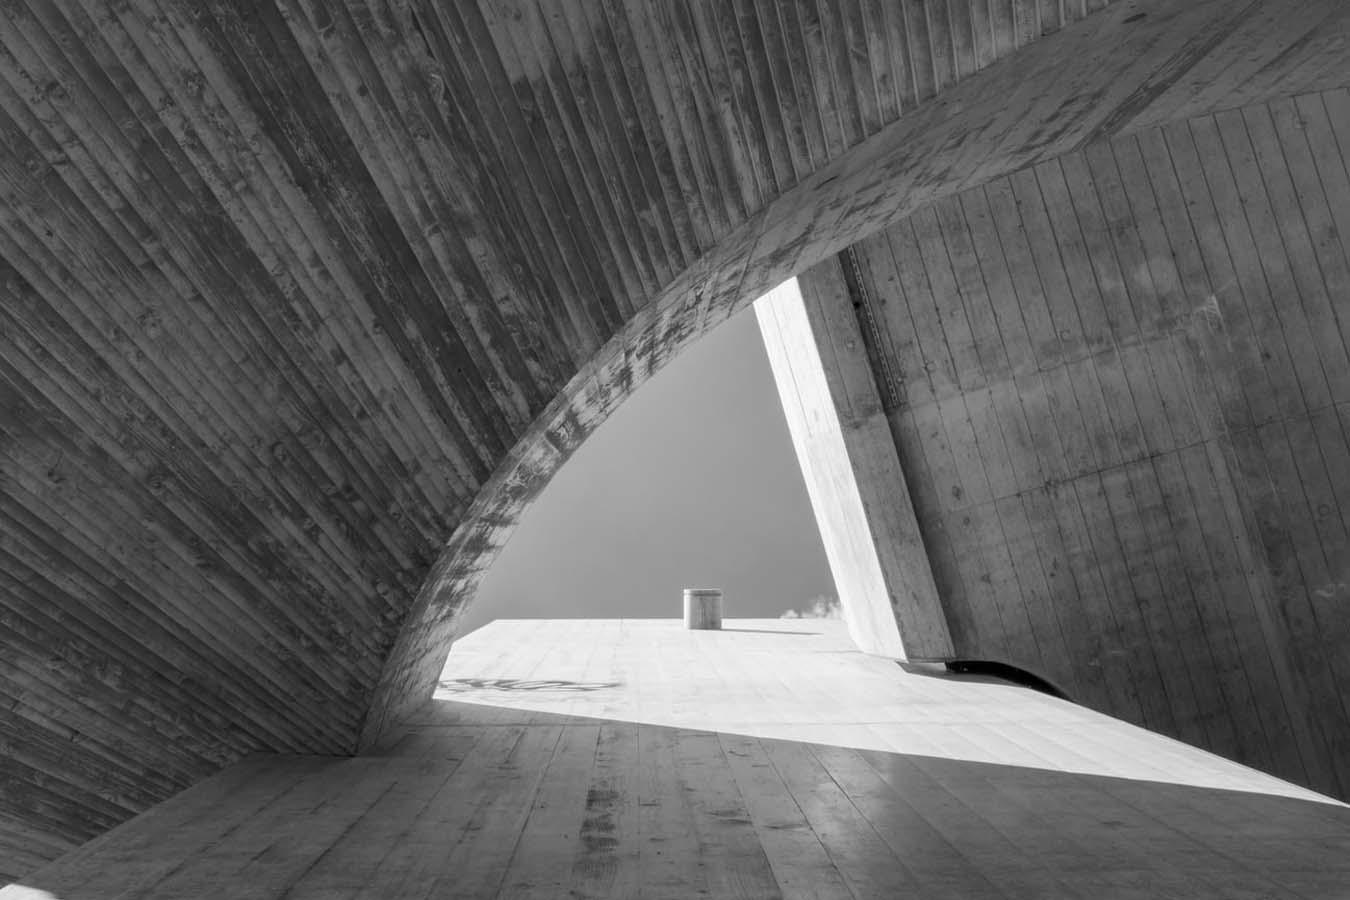 Archisoup-monochrome-architecture-photography.jpg